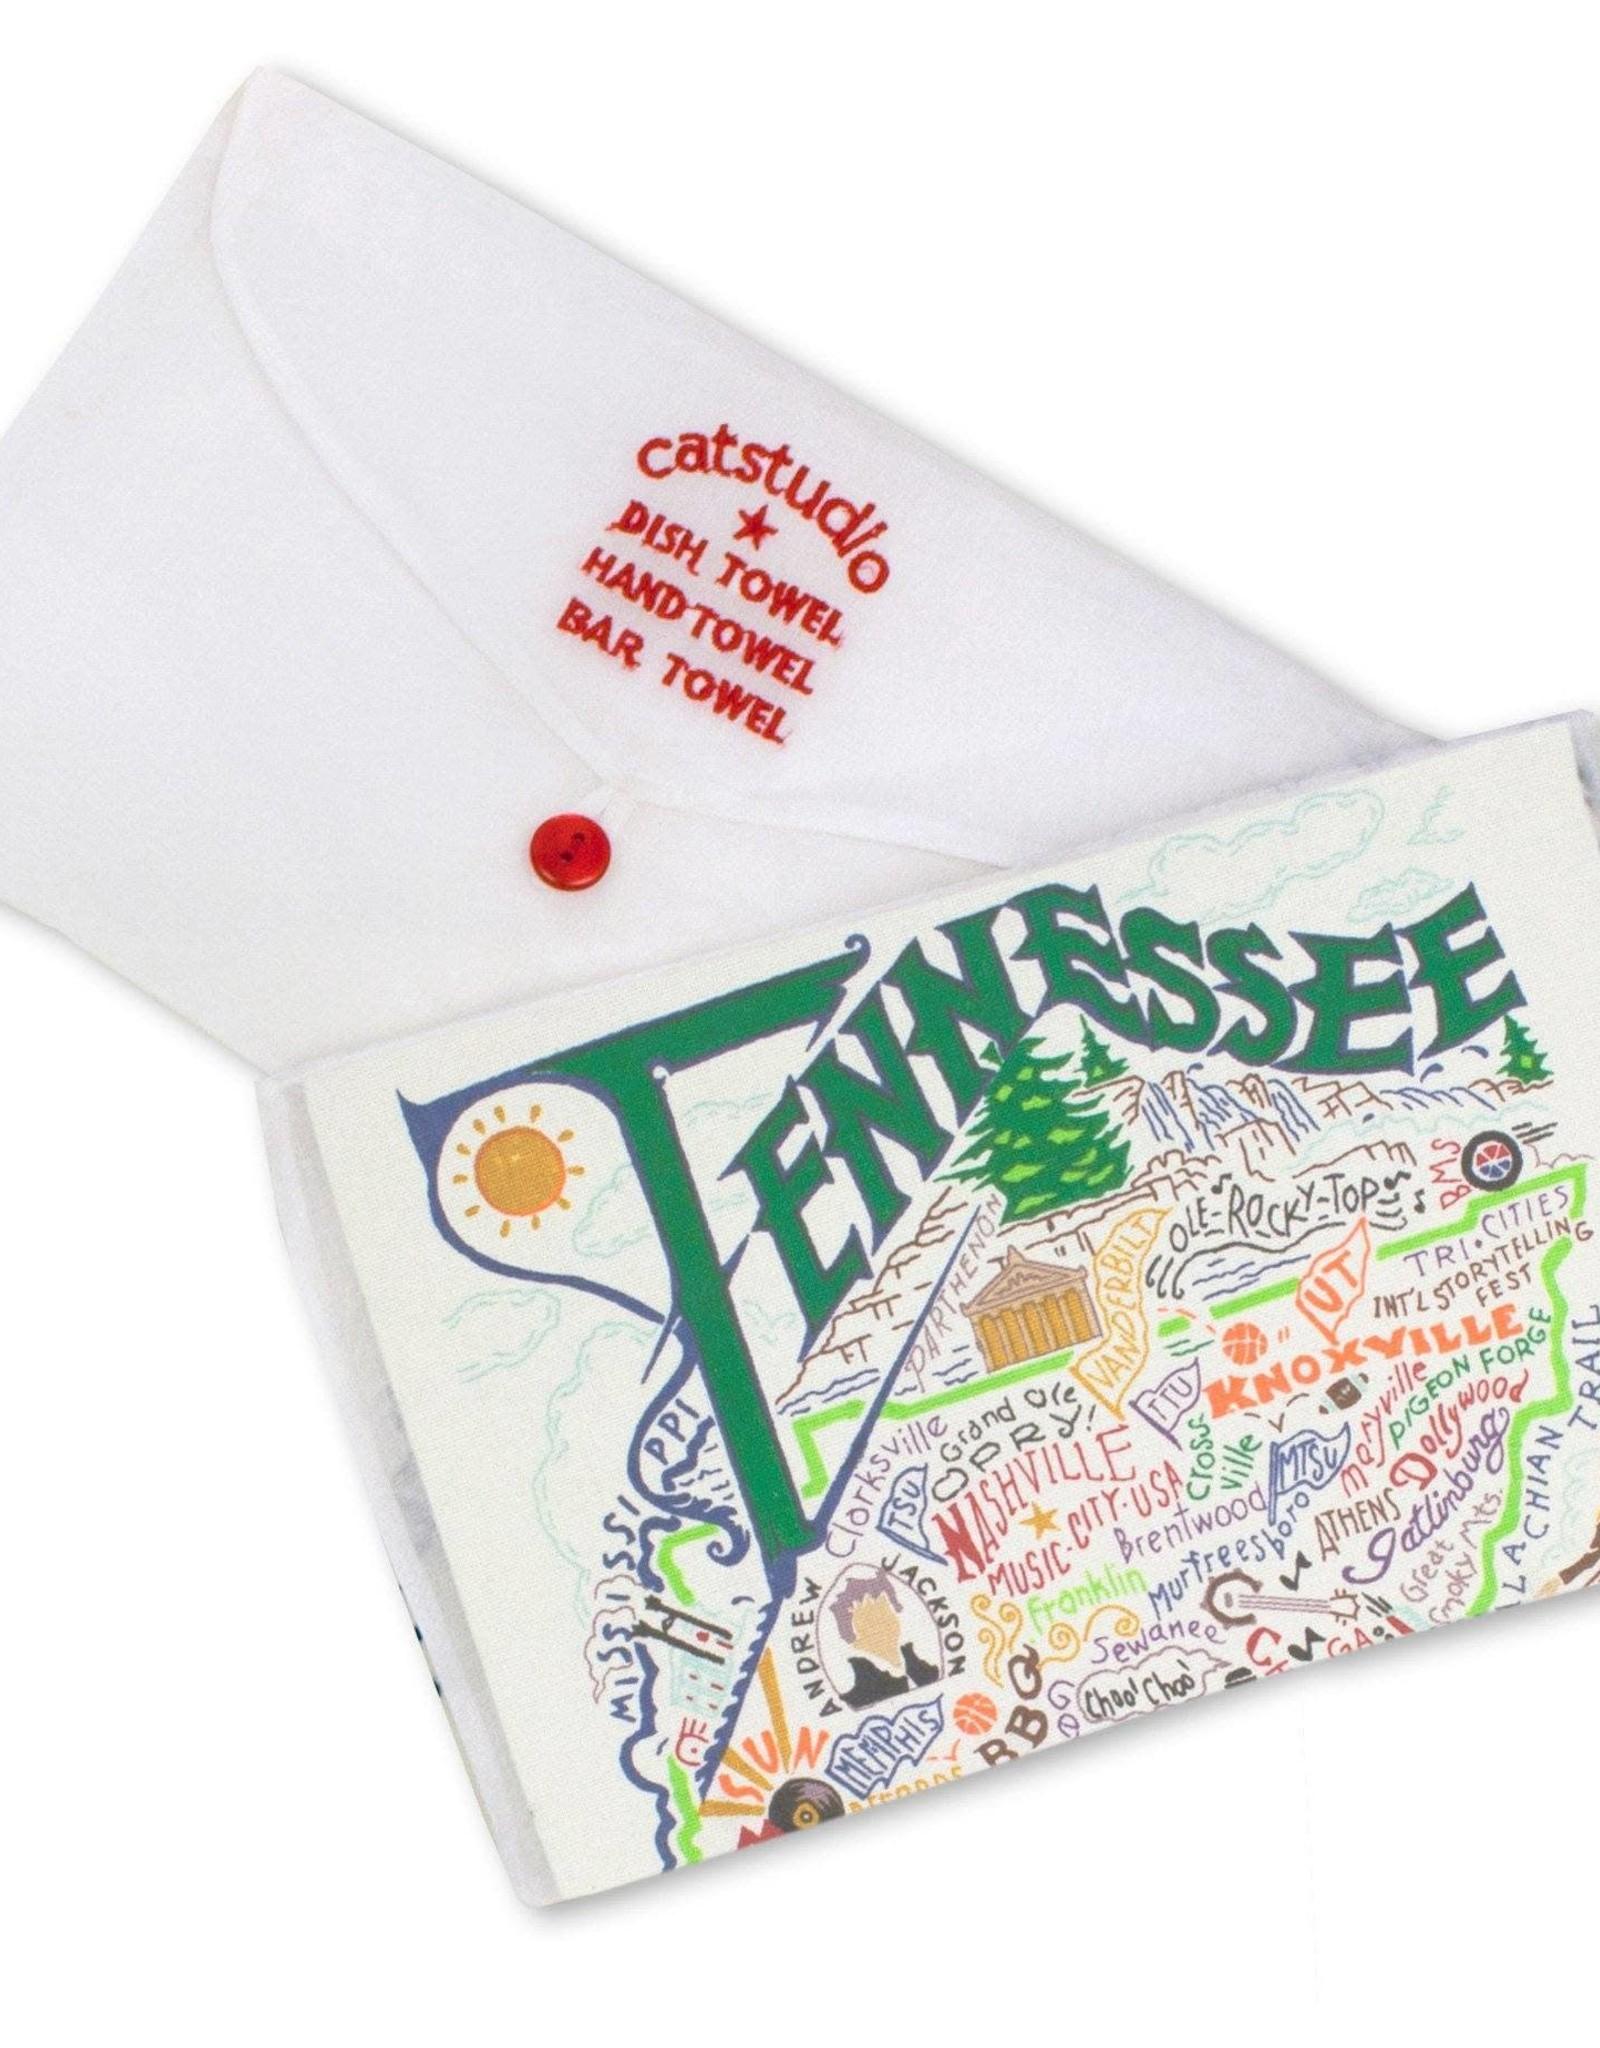 Catstudio Catstudio State Dish Towel Tennessee